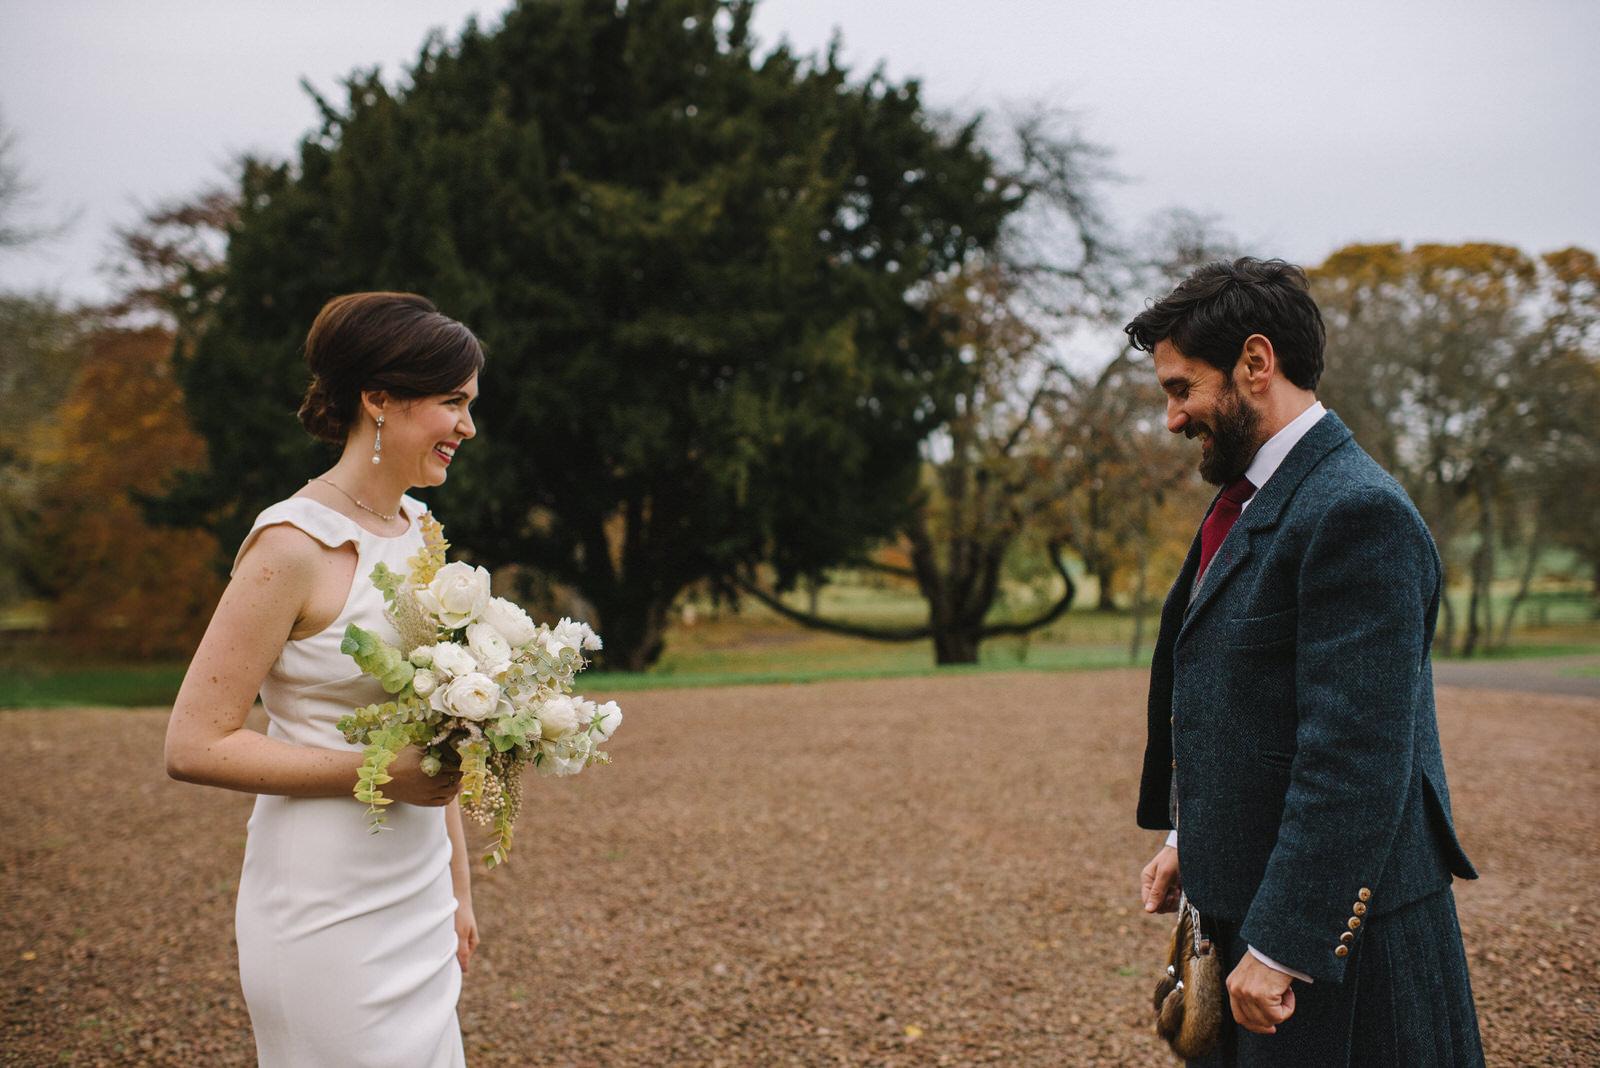 017-COLSTOUN-HOUSE-WEDDING-ALTERNATIVE-WEDDING-PHOTOGRAPHER-GLASGOW-WEDDING-PHOTOGRAPHER-STYLISH-SCOTTISH-WEDDING.JPG